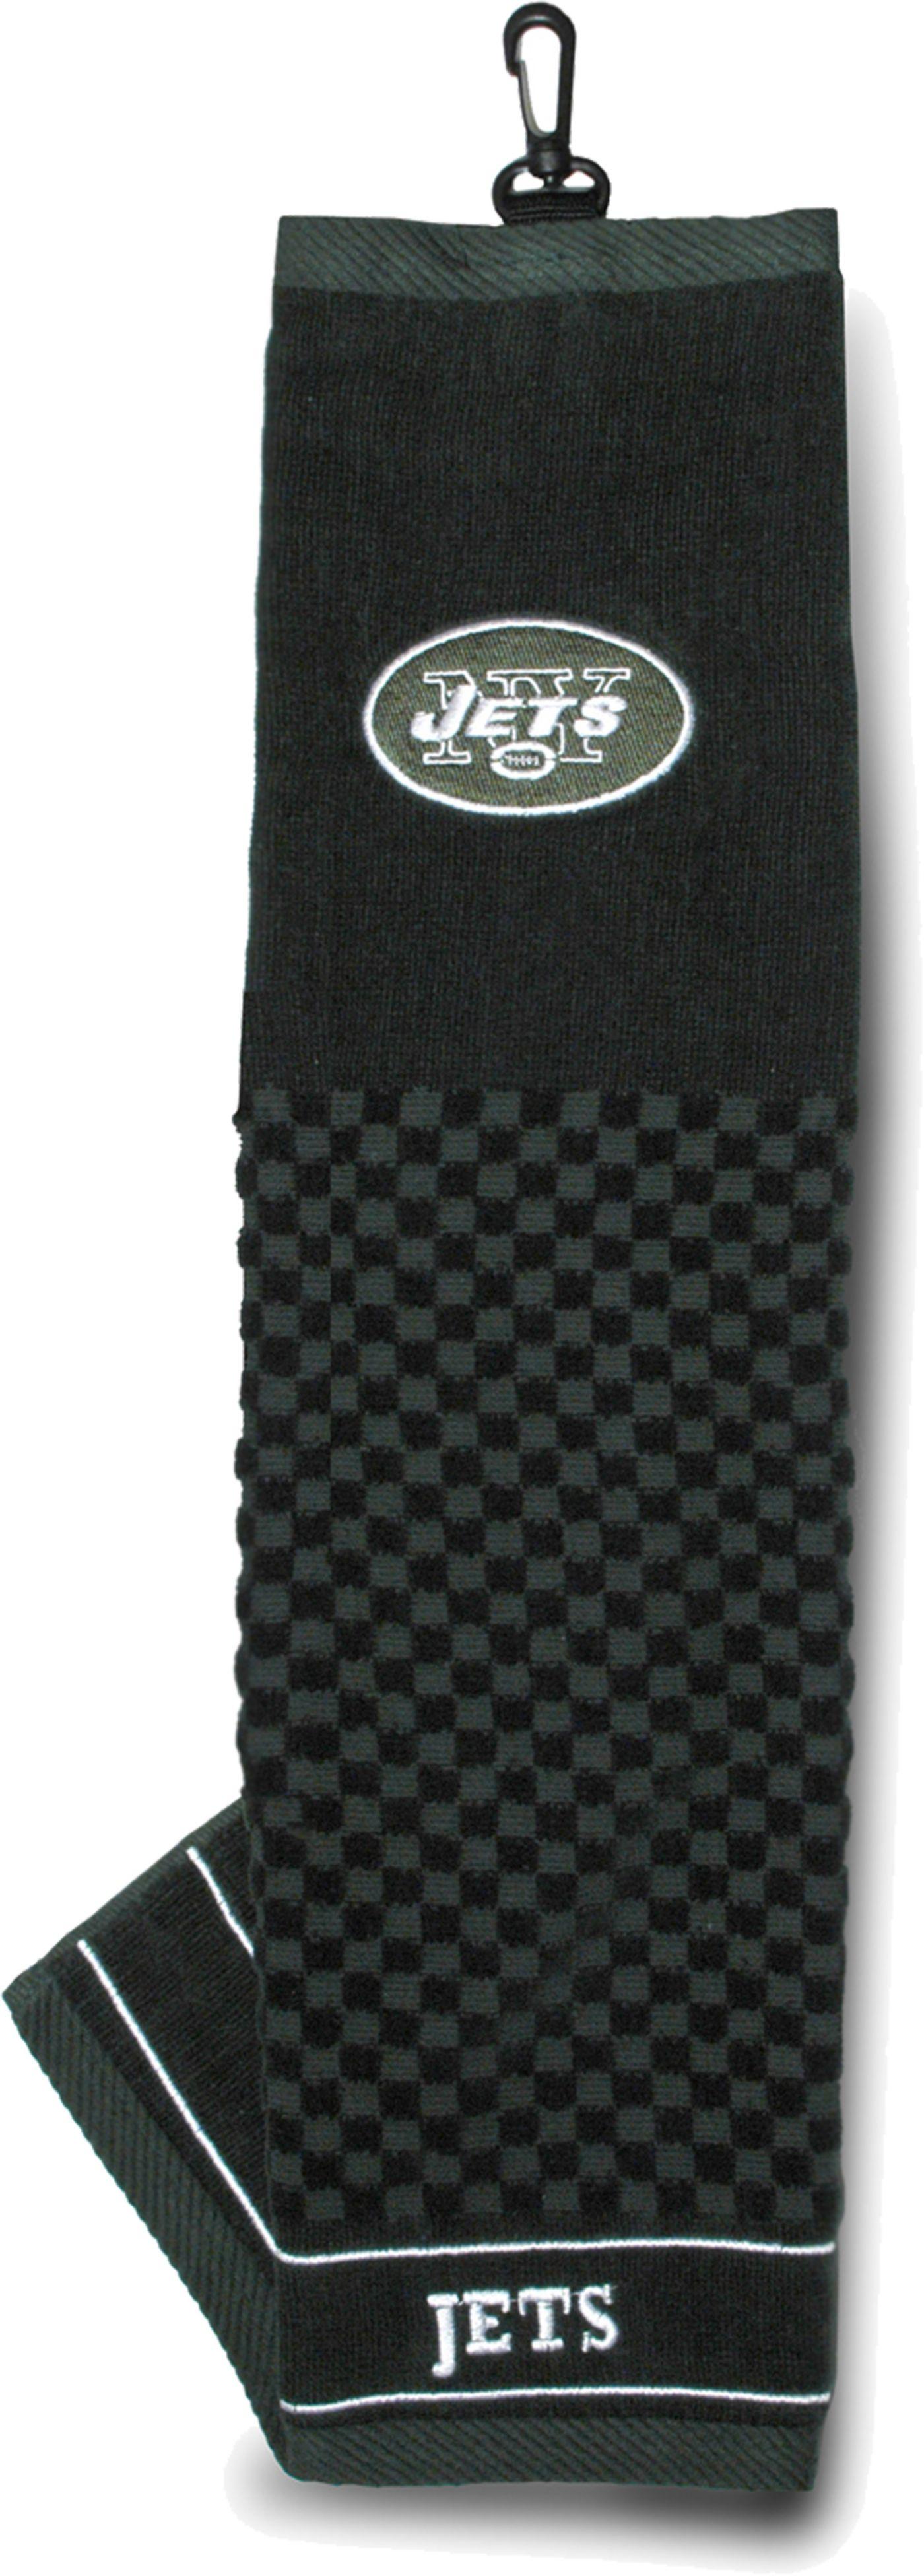 Team Golf New York Jets Embroidered Golf Towel